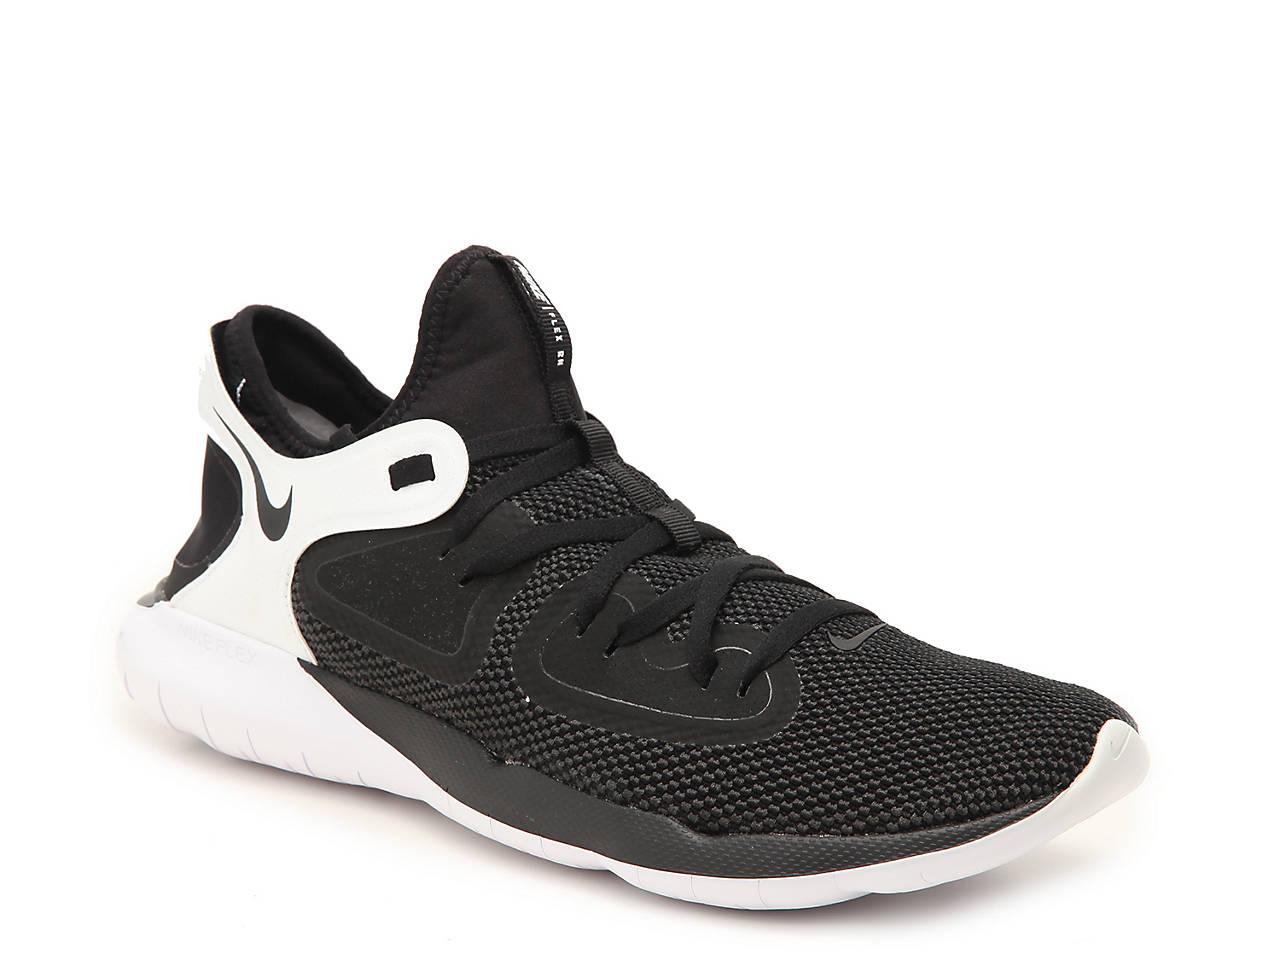 440f971e16ac Nike Flex 2019 RN Lightweight Running Shoe - Men s Men s Shoes